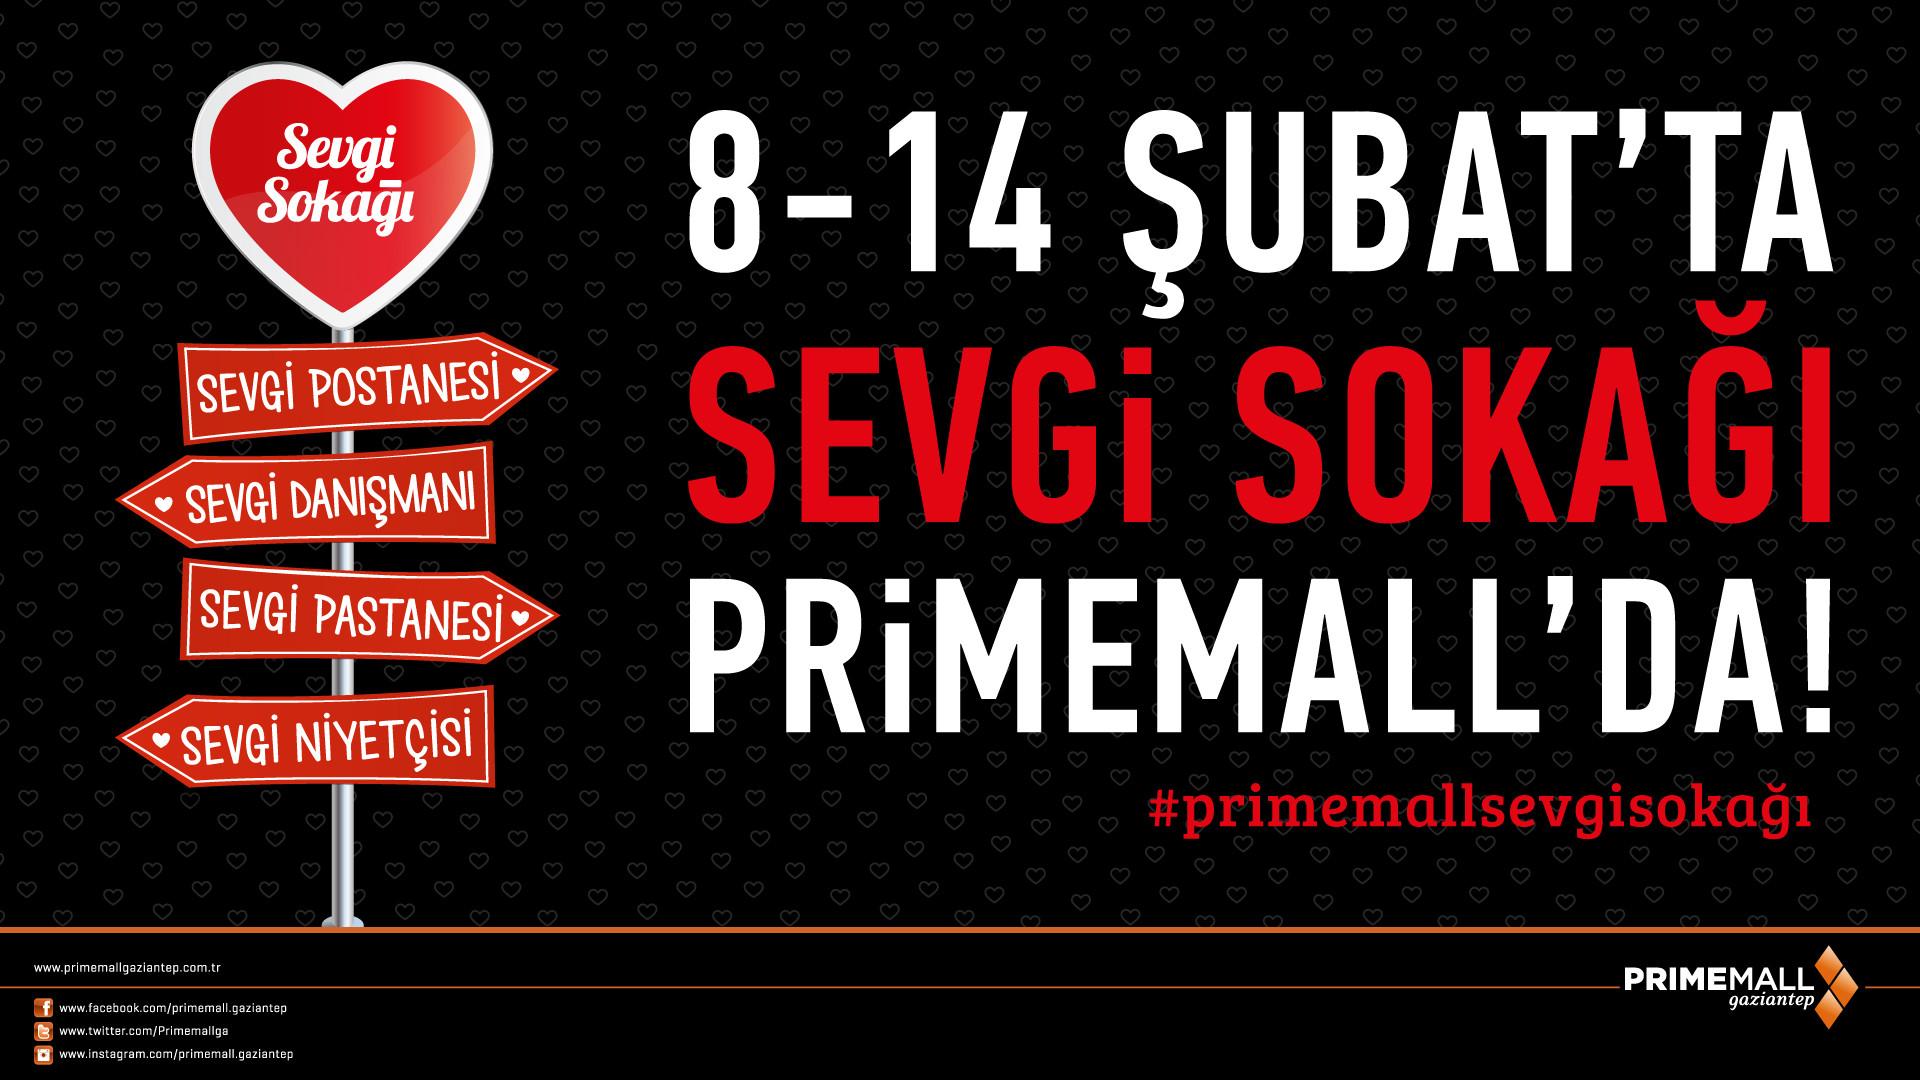 8-14 Şubat'ta Sevgi Sokağı Primemall'da!